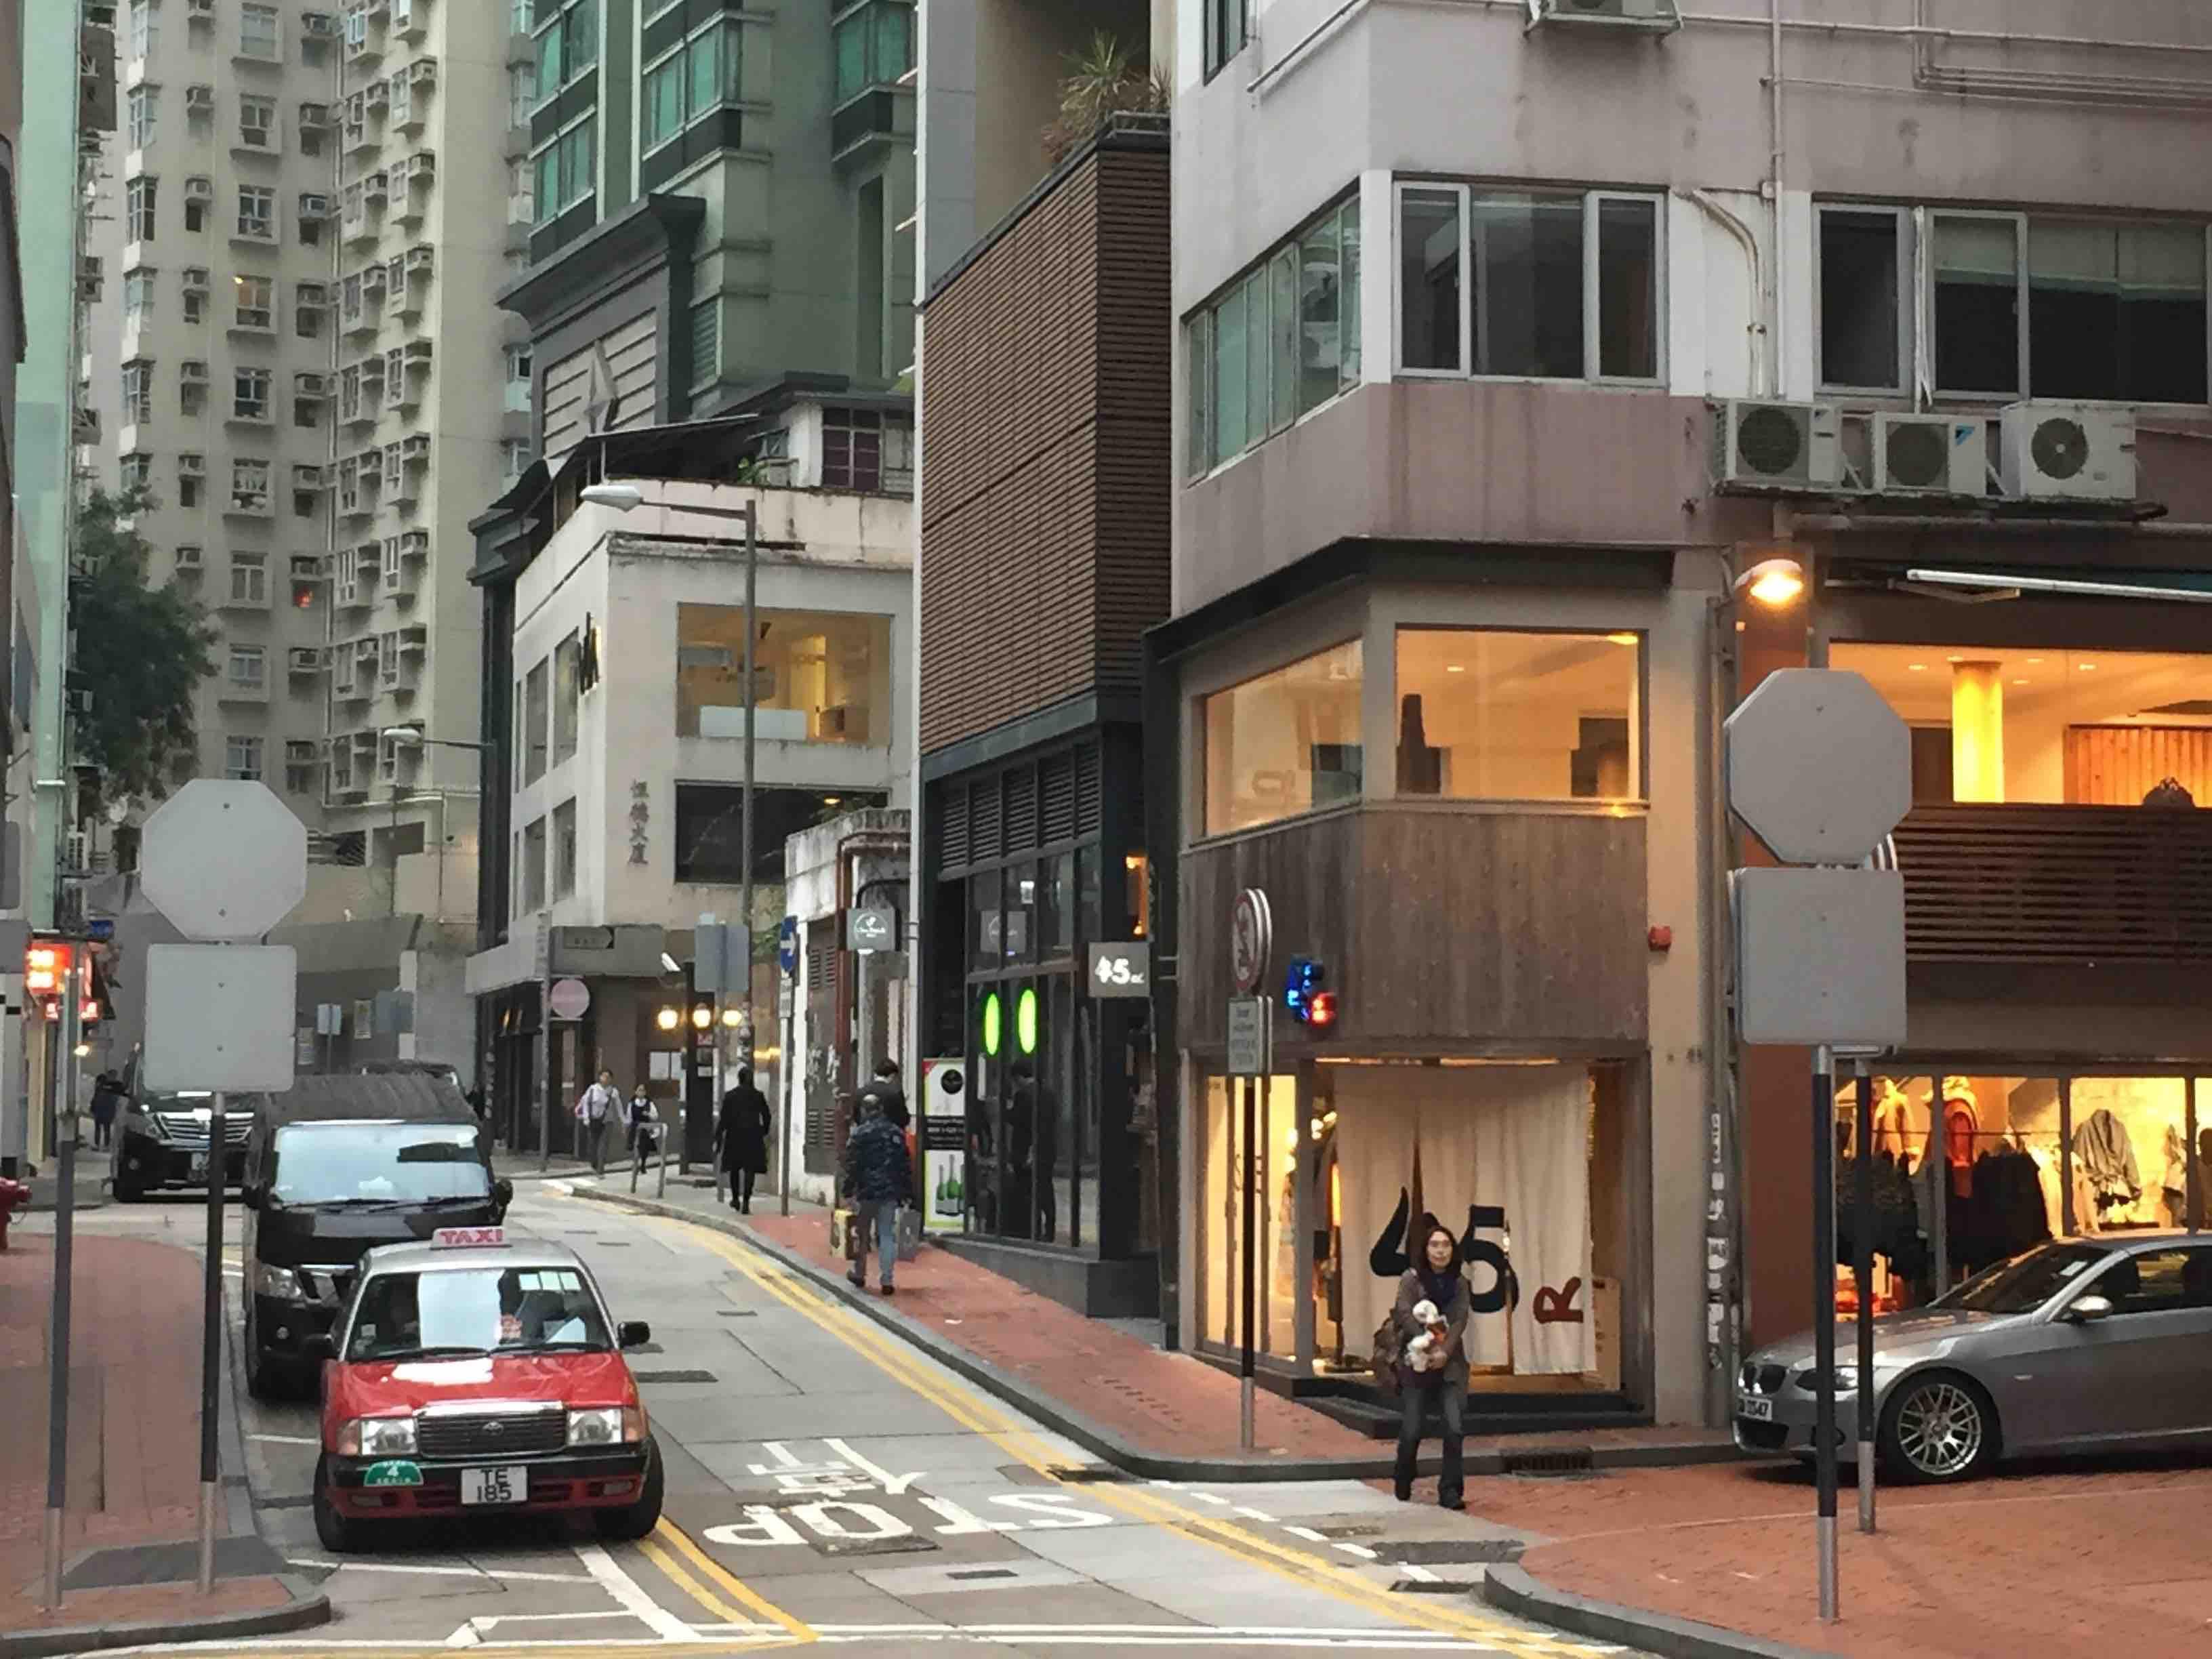 Star Street-restaurants and bars